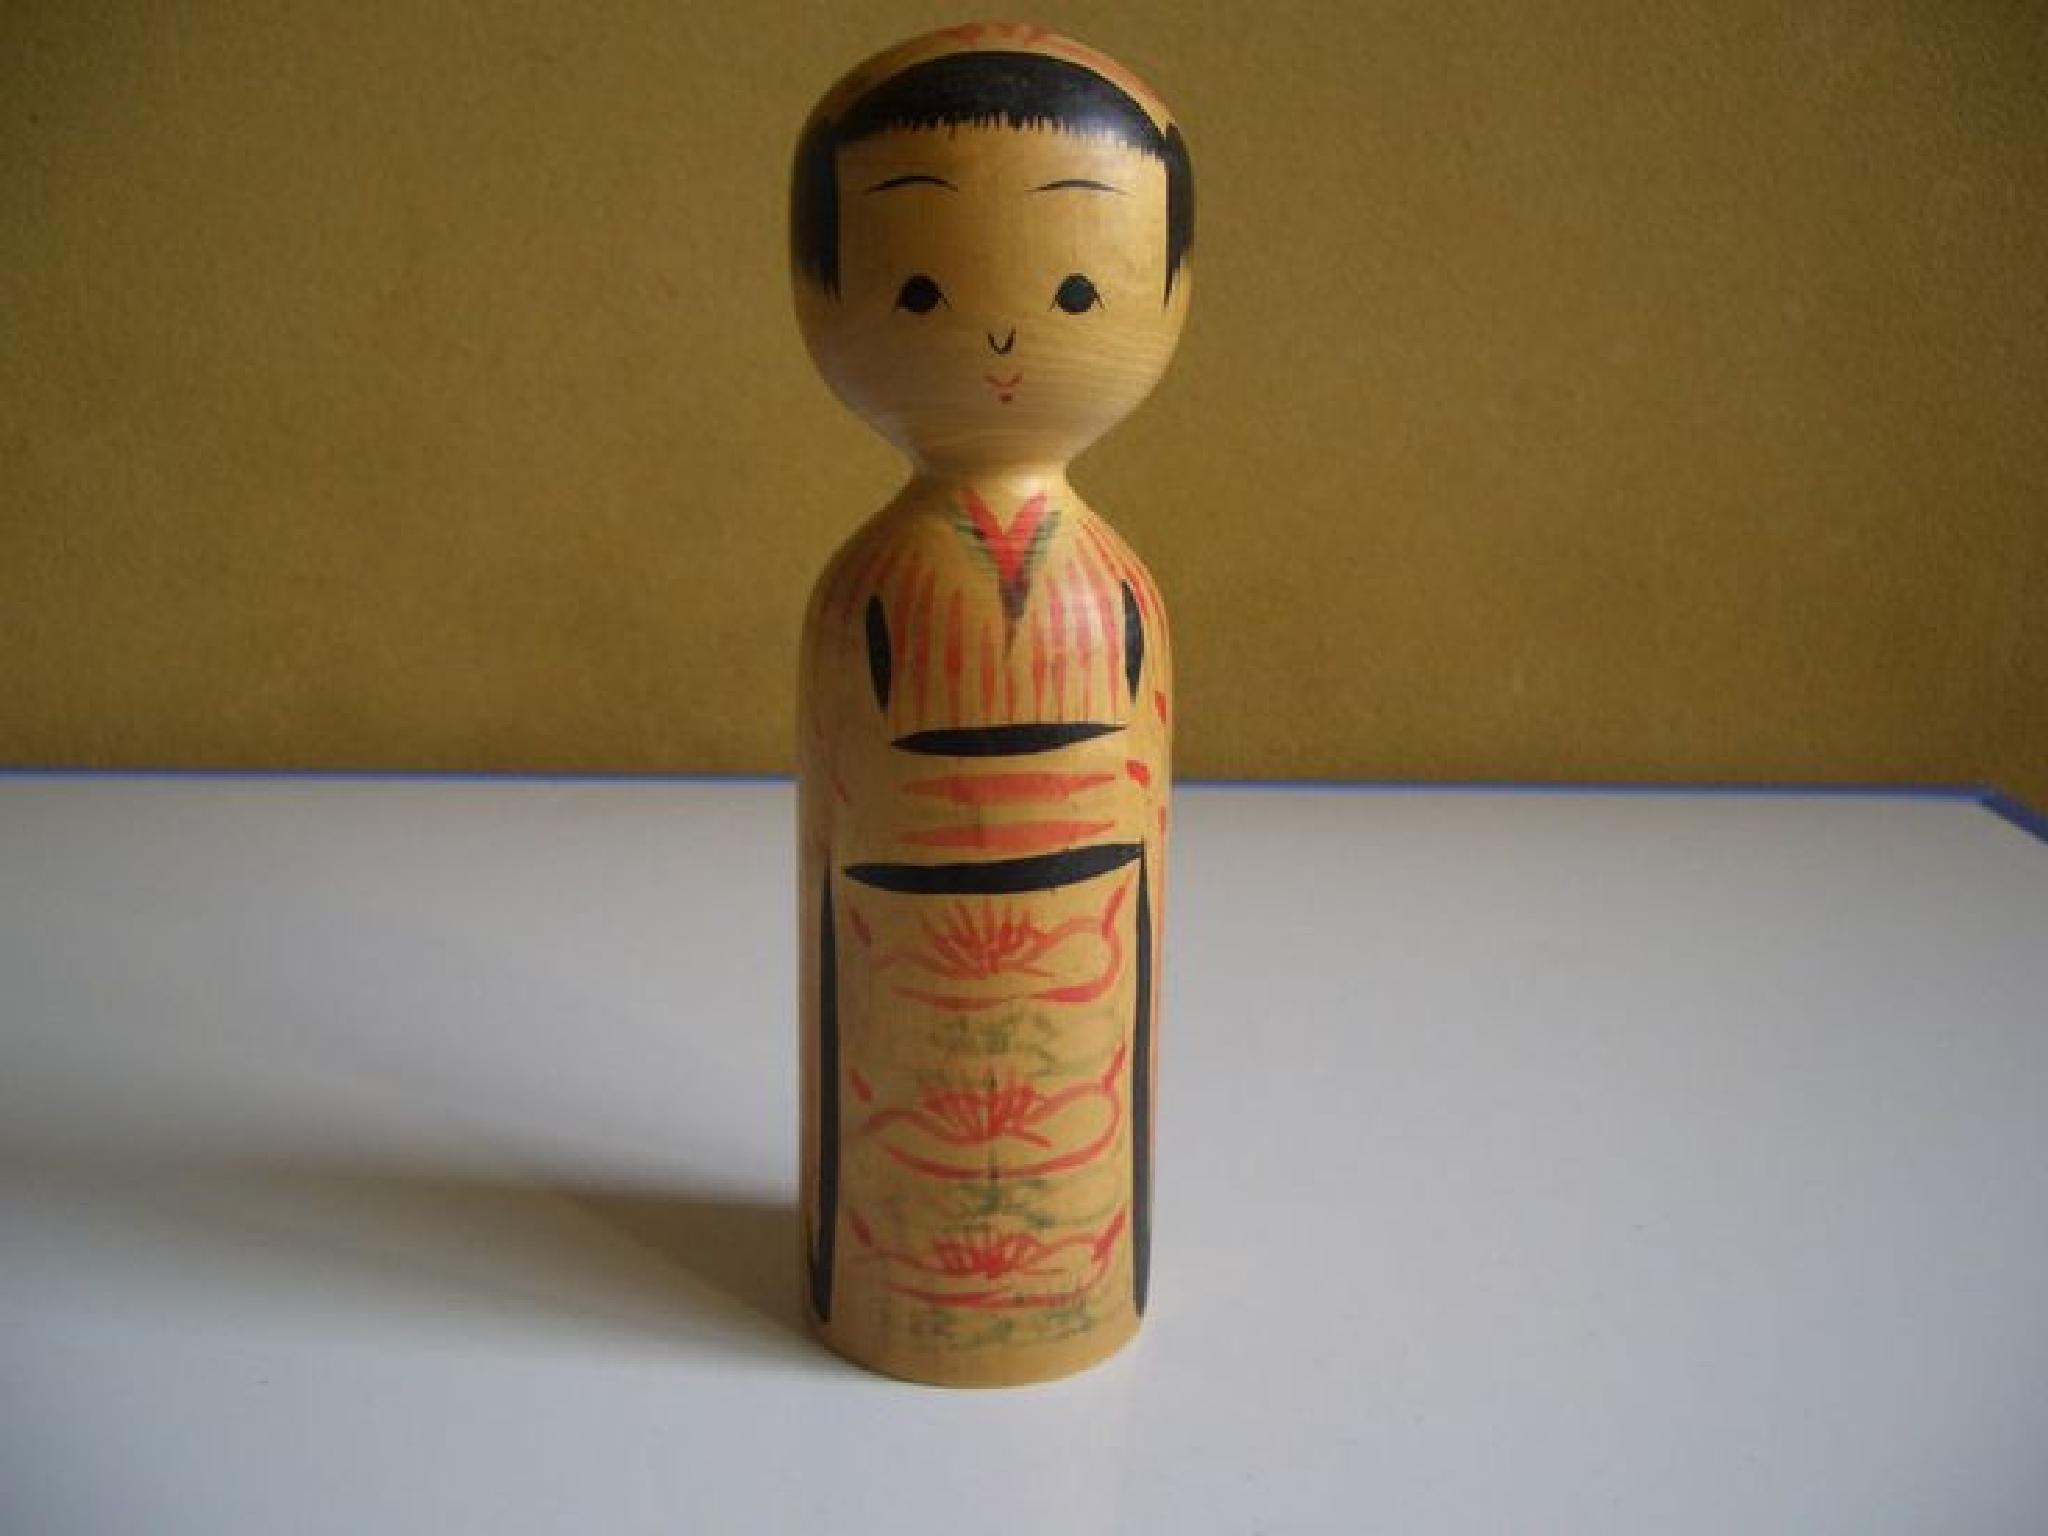 Japanese kijiyama style kokeshi doll Miyahara Yasuharu 2001 by Hiroshi Fukushima